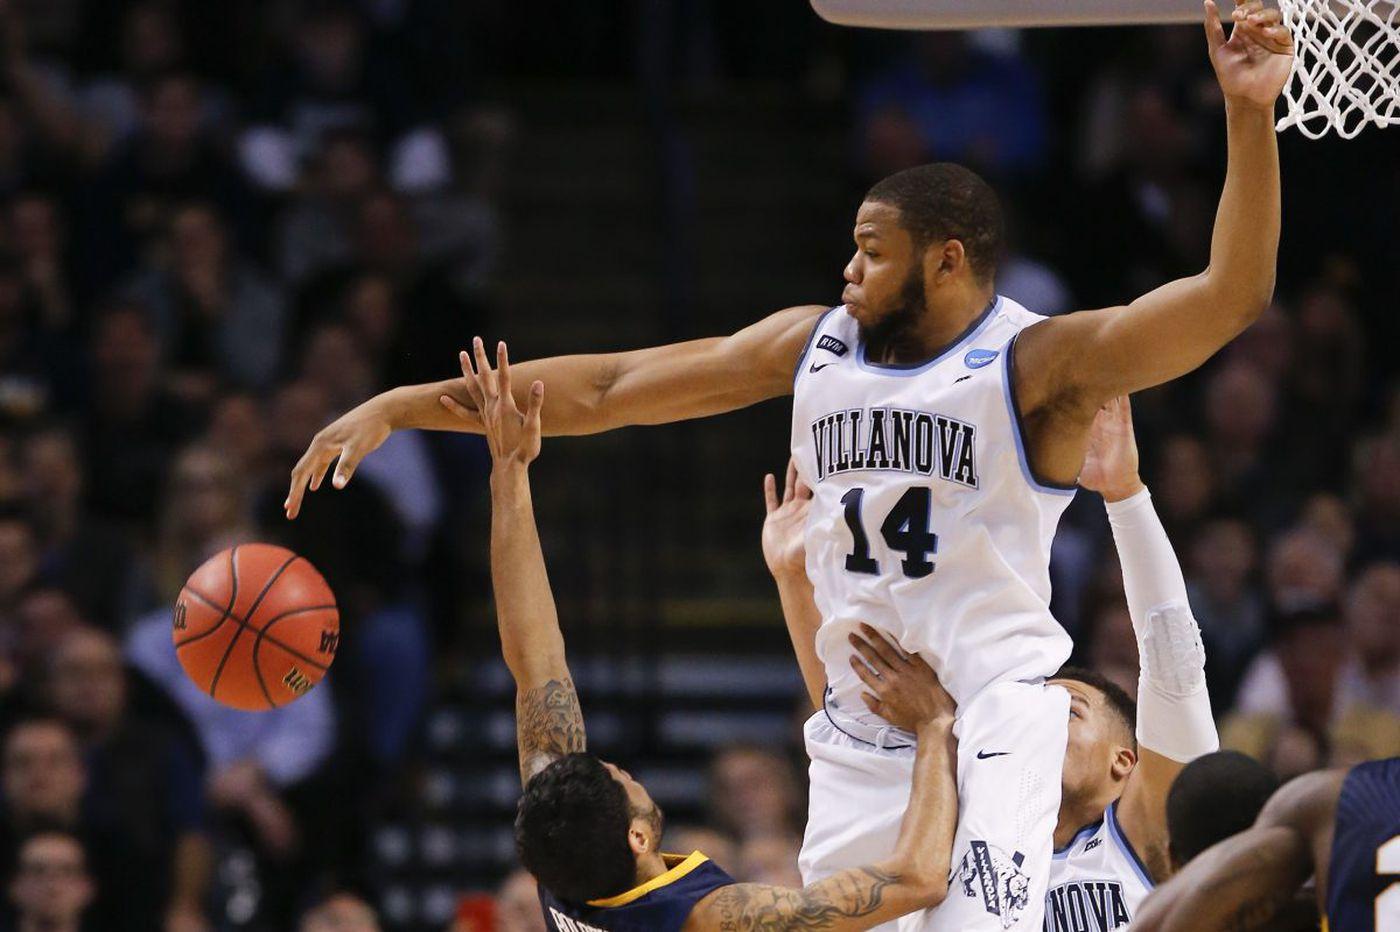 Villanova outlasts West Virginia in Sweet 16, 90-78